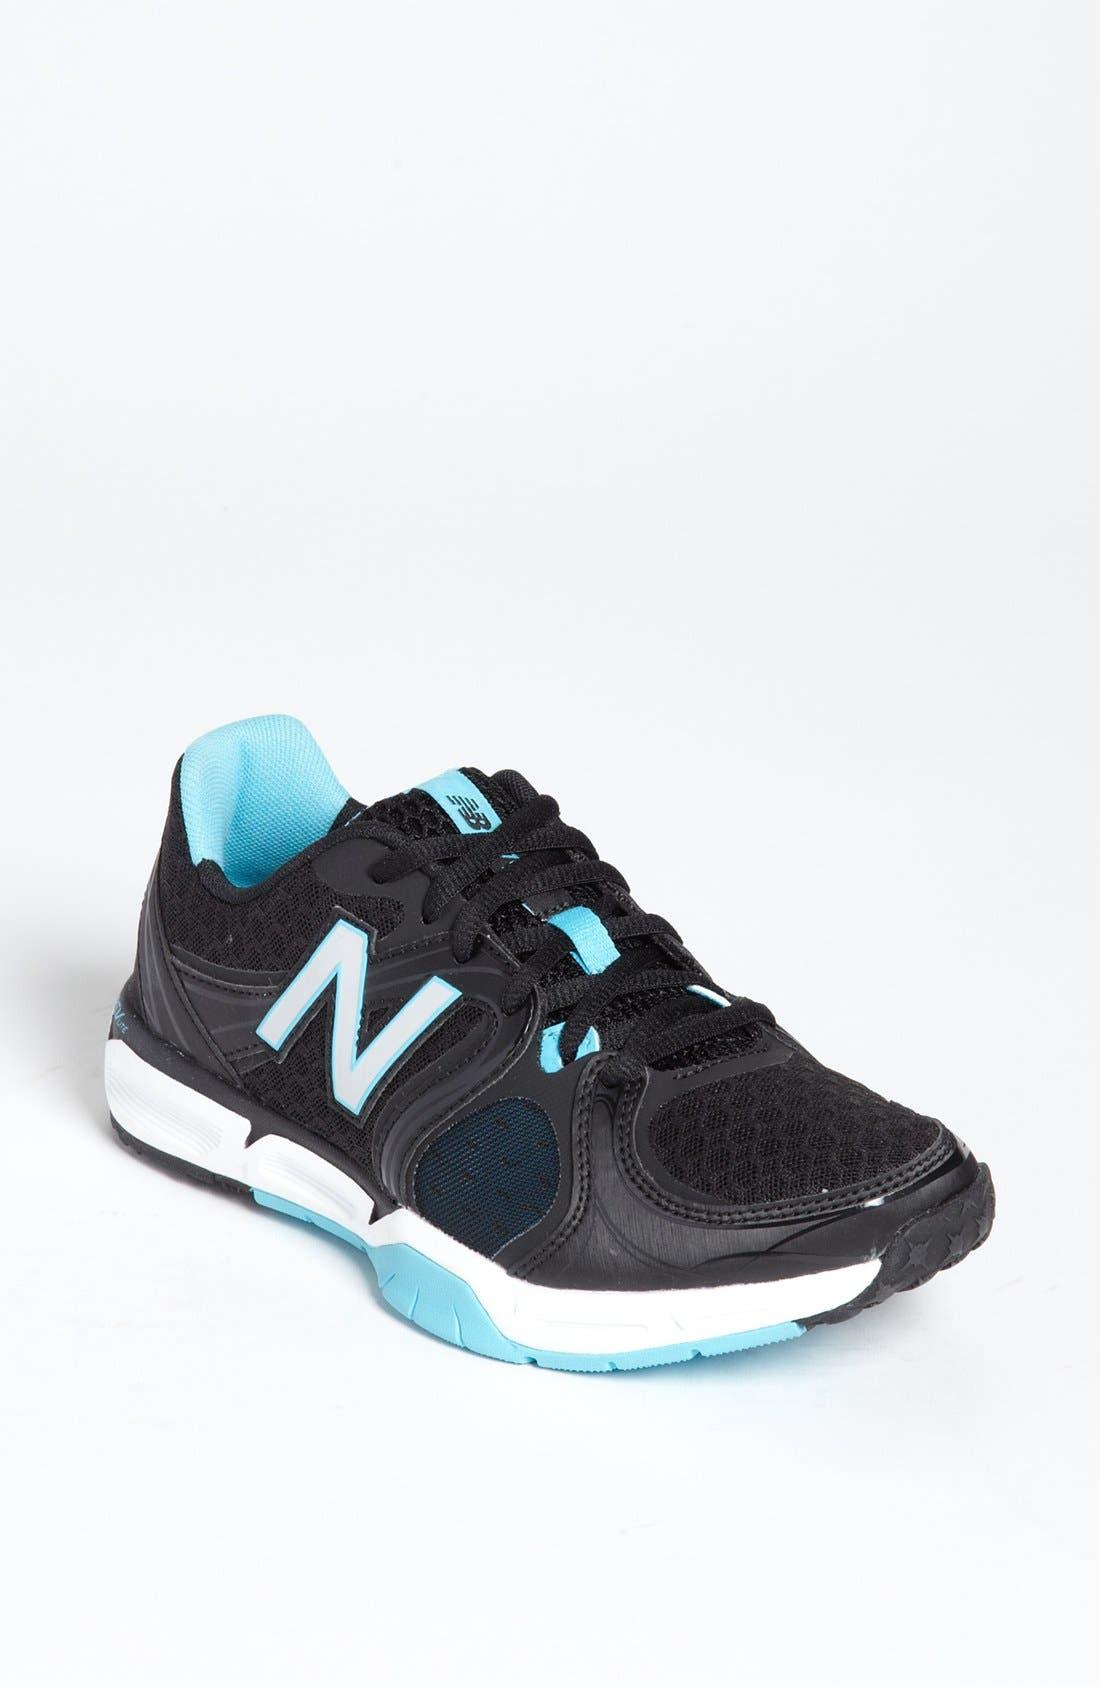 Alternate Image 1 Selected - New Balance '797' Training Shoe (Women) (Online Only)